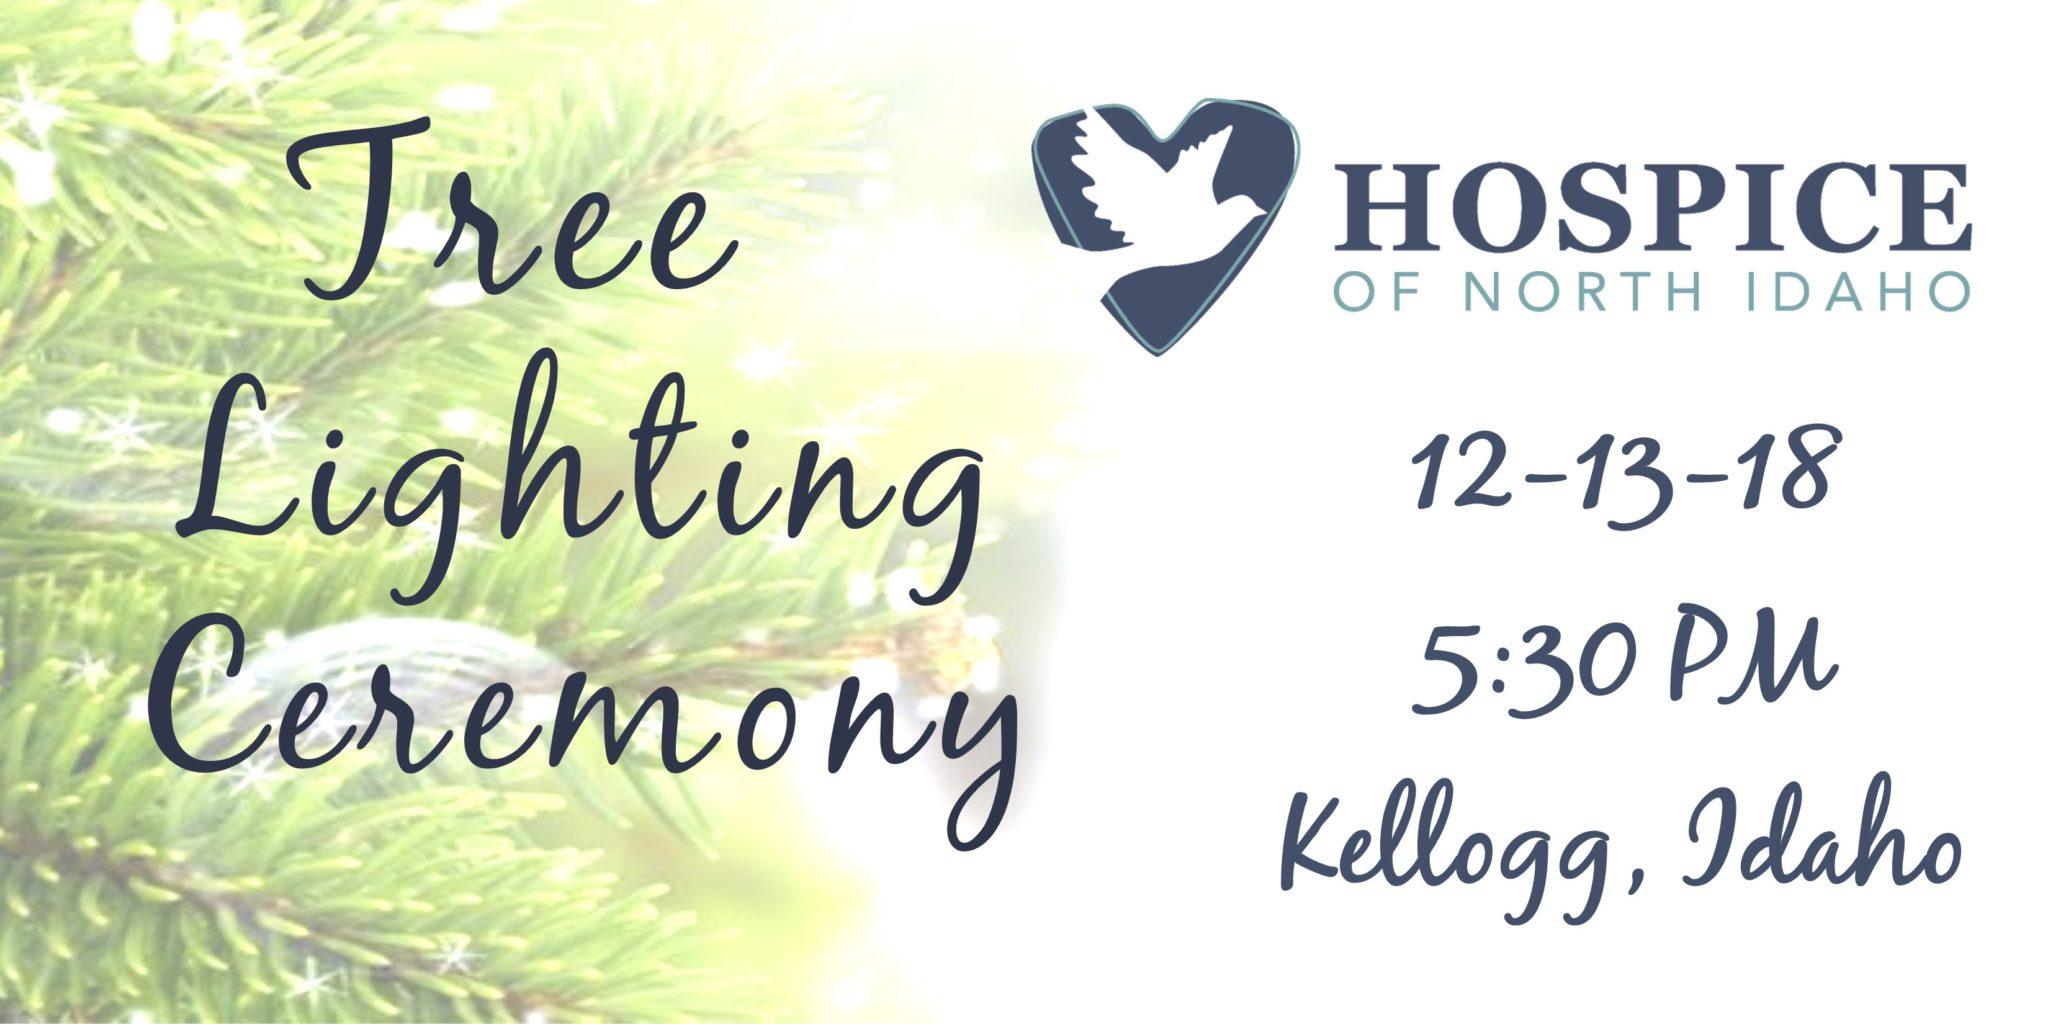 Tree Lighting Ceremony Kellogg December 13 5:30 pm Kellogg